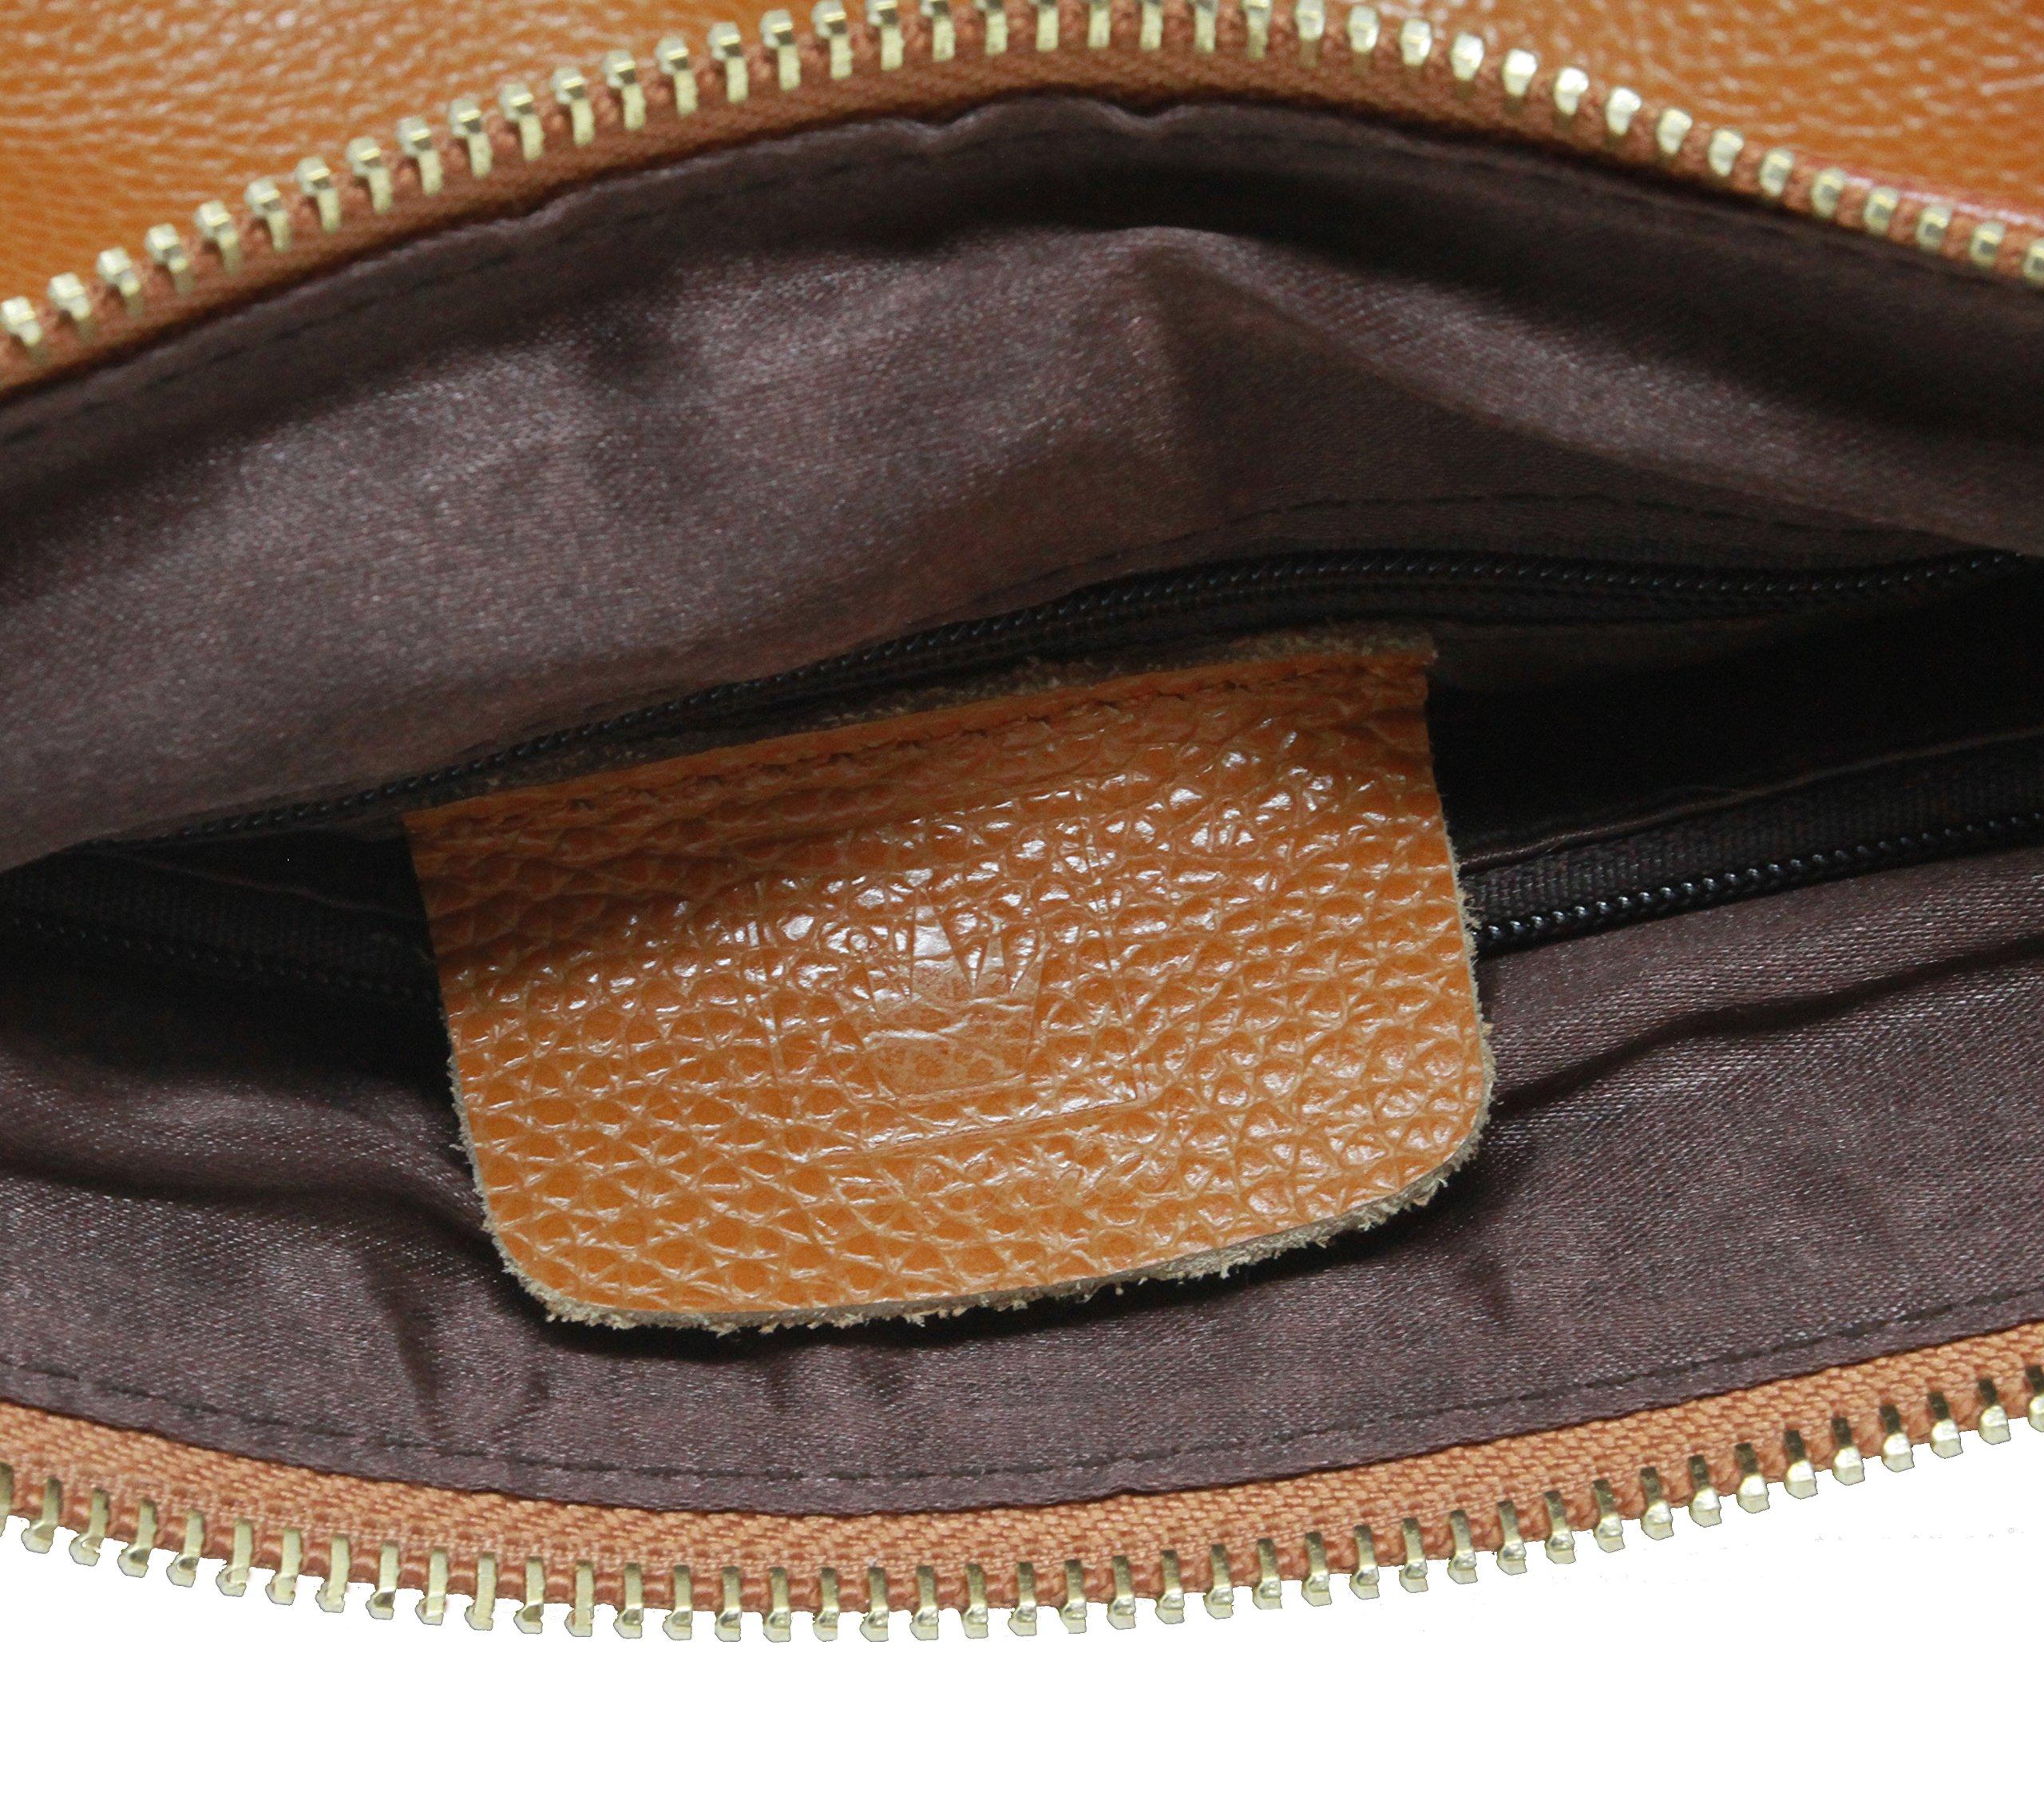 By Olivia - Women's Vintage Soft Genuine Leather Tote or Large Shoulder Bag with Outside Side Zipper Pocket by Olivia (Image #4)